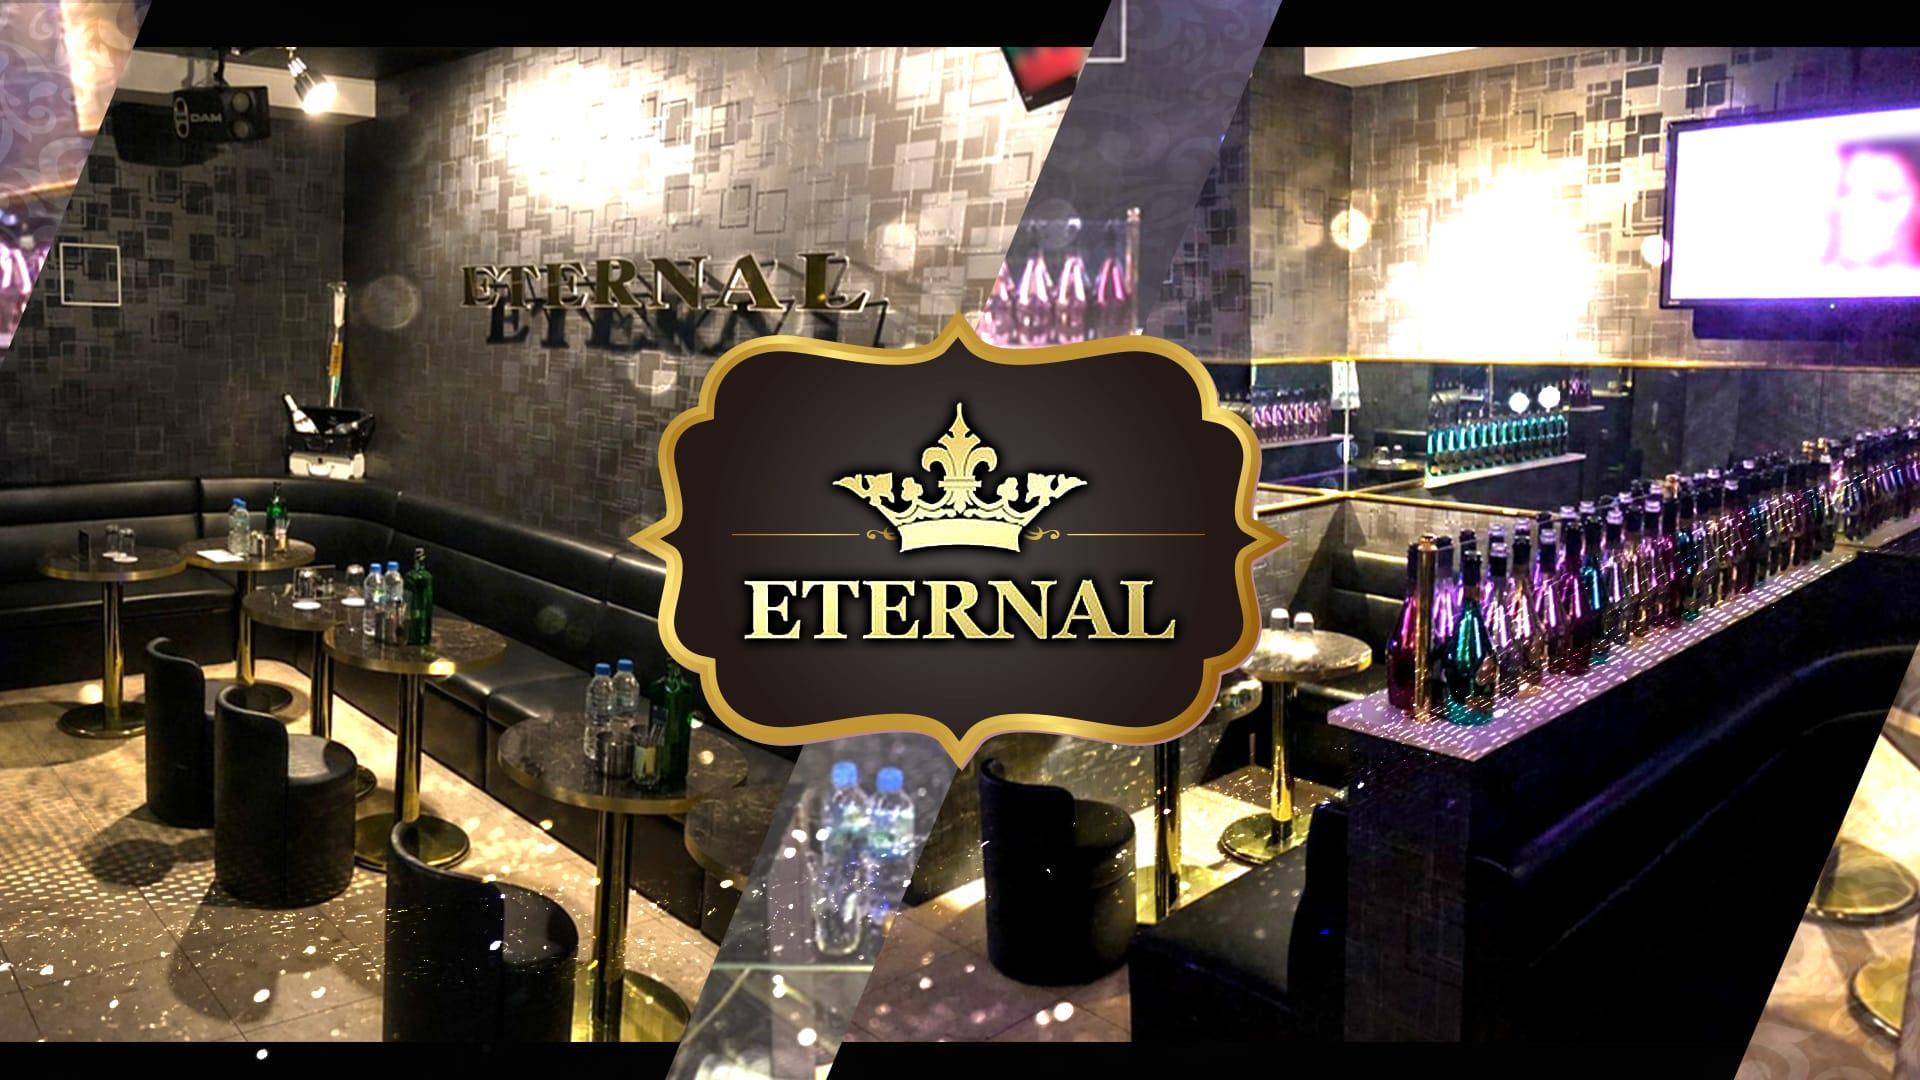 ETERNAL(エターナル) 錦糸町キャバクラ TOP画像